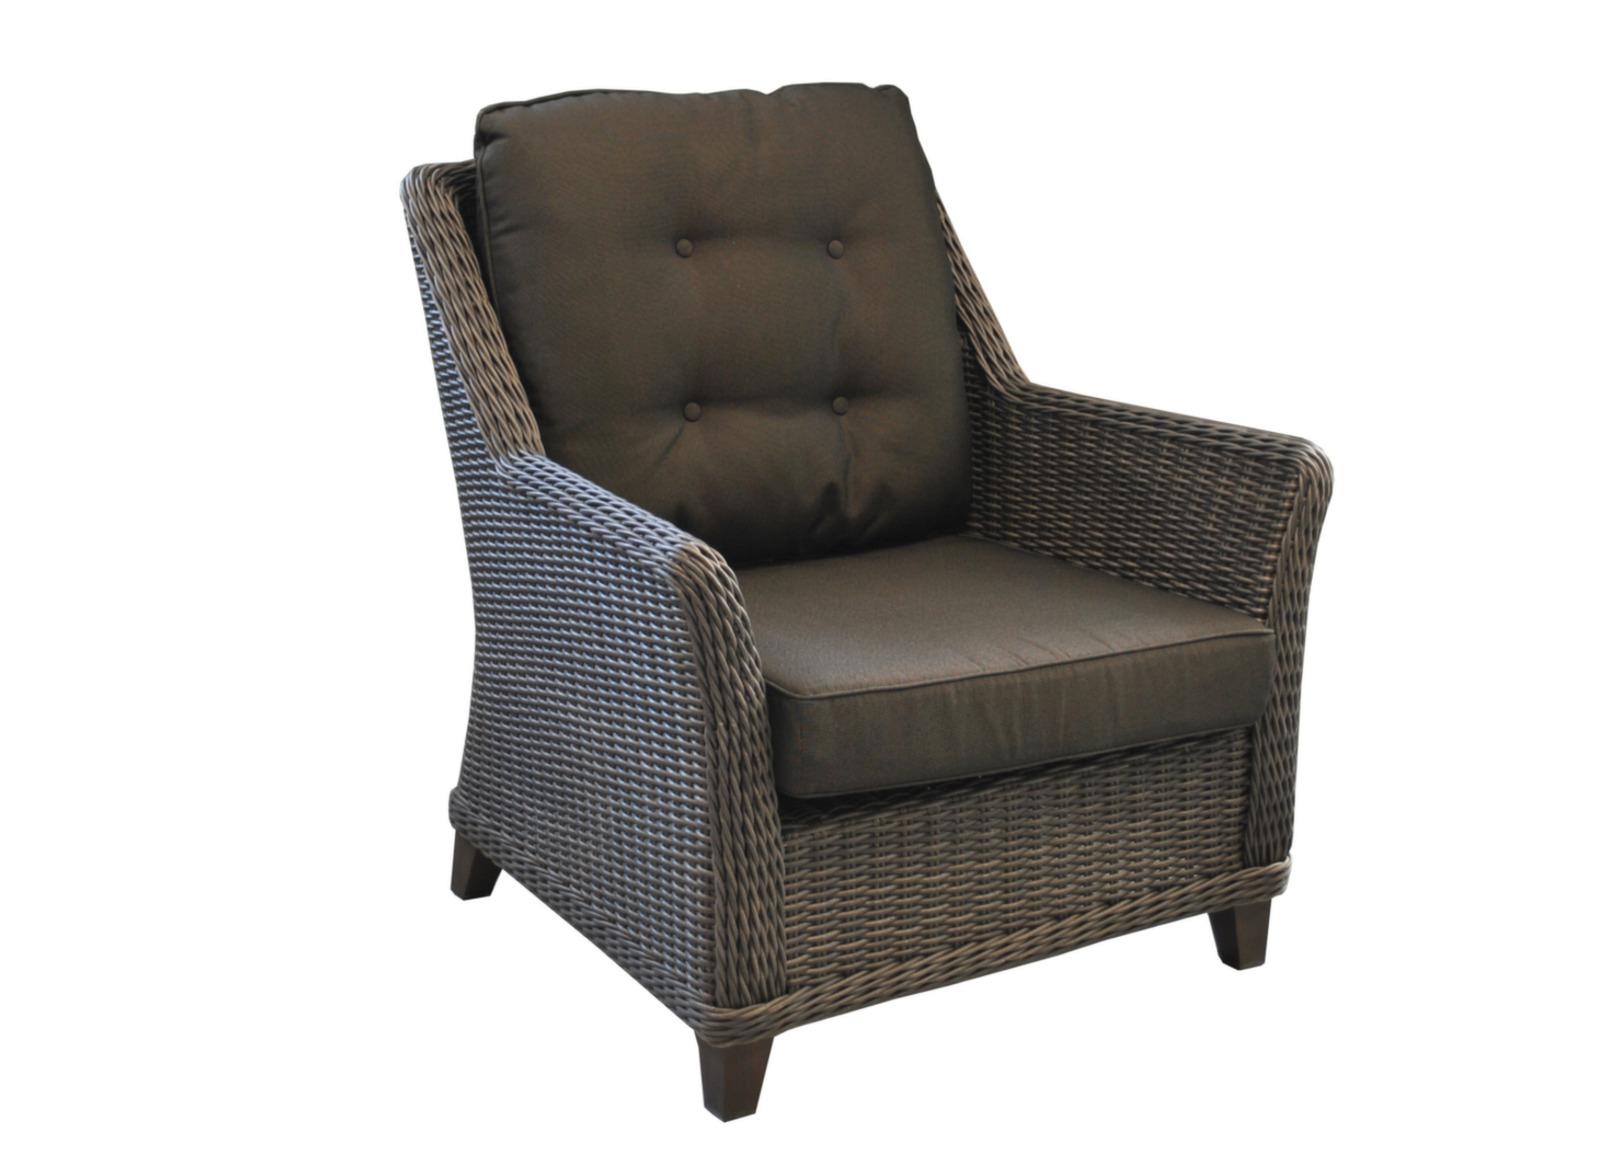 fauteuil d tente madura fauteuils de jardin mobilier pour salon de jardin repas proloisirs. Black Bedroom Furniture Sets. Home Design Ideas